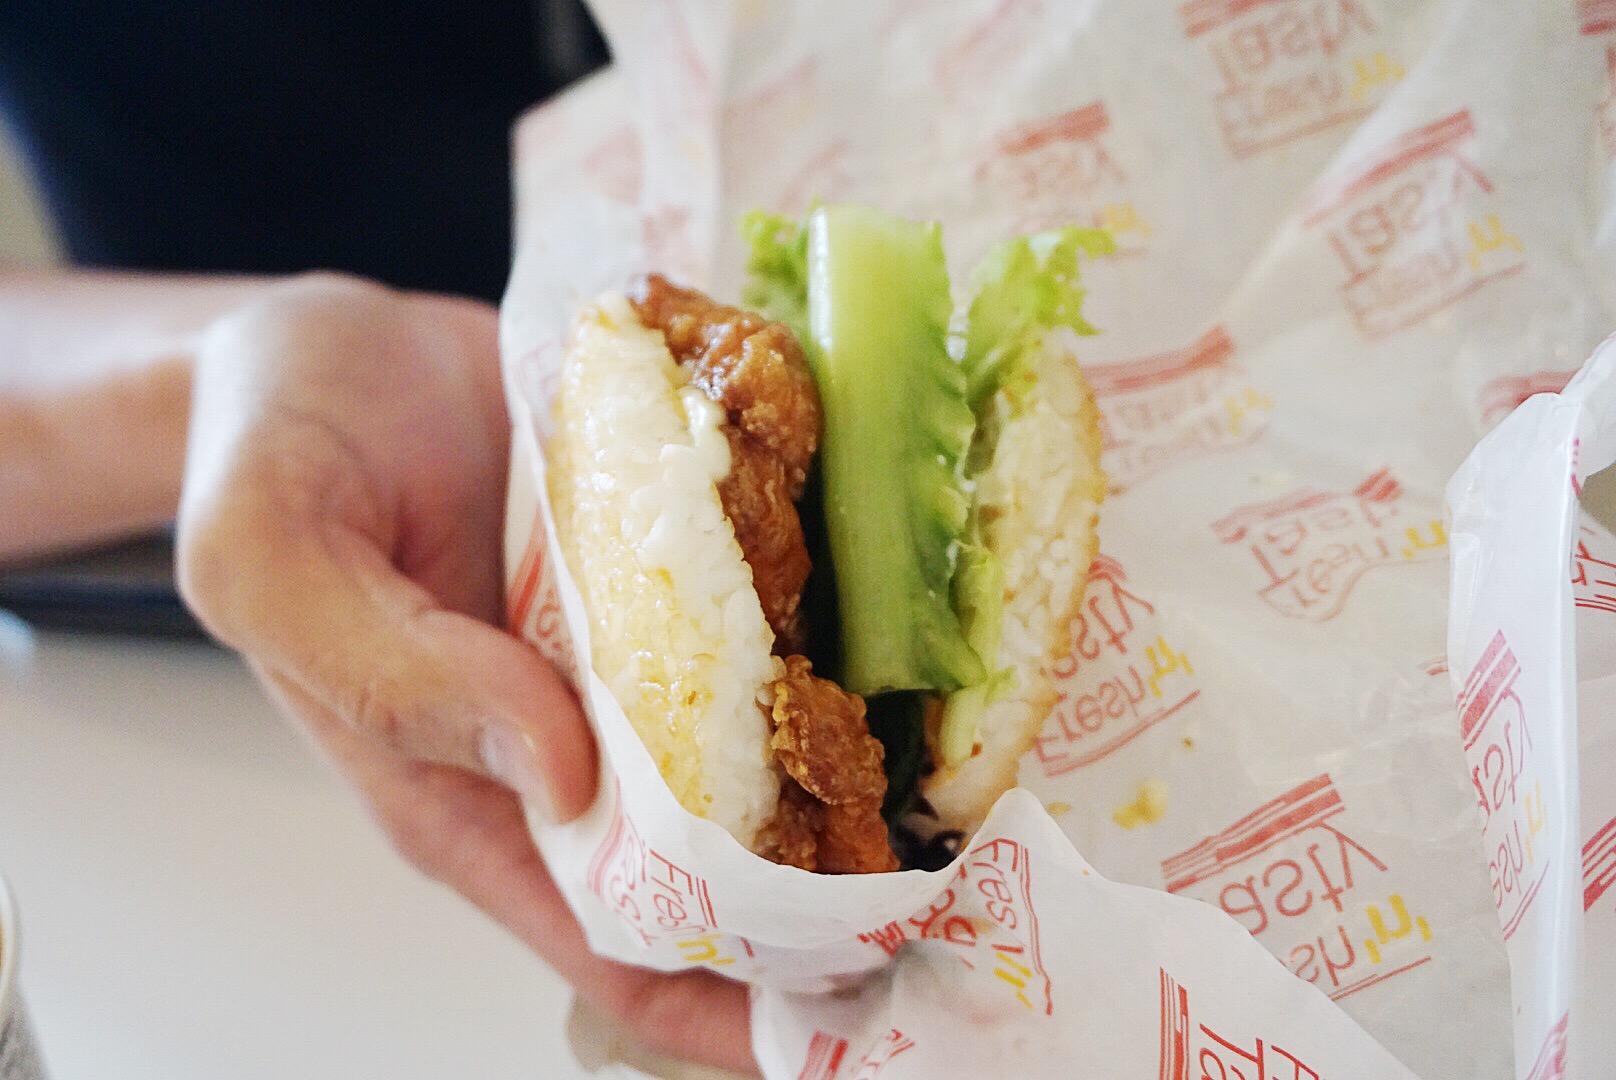 DON rice burger